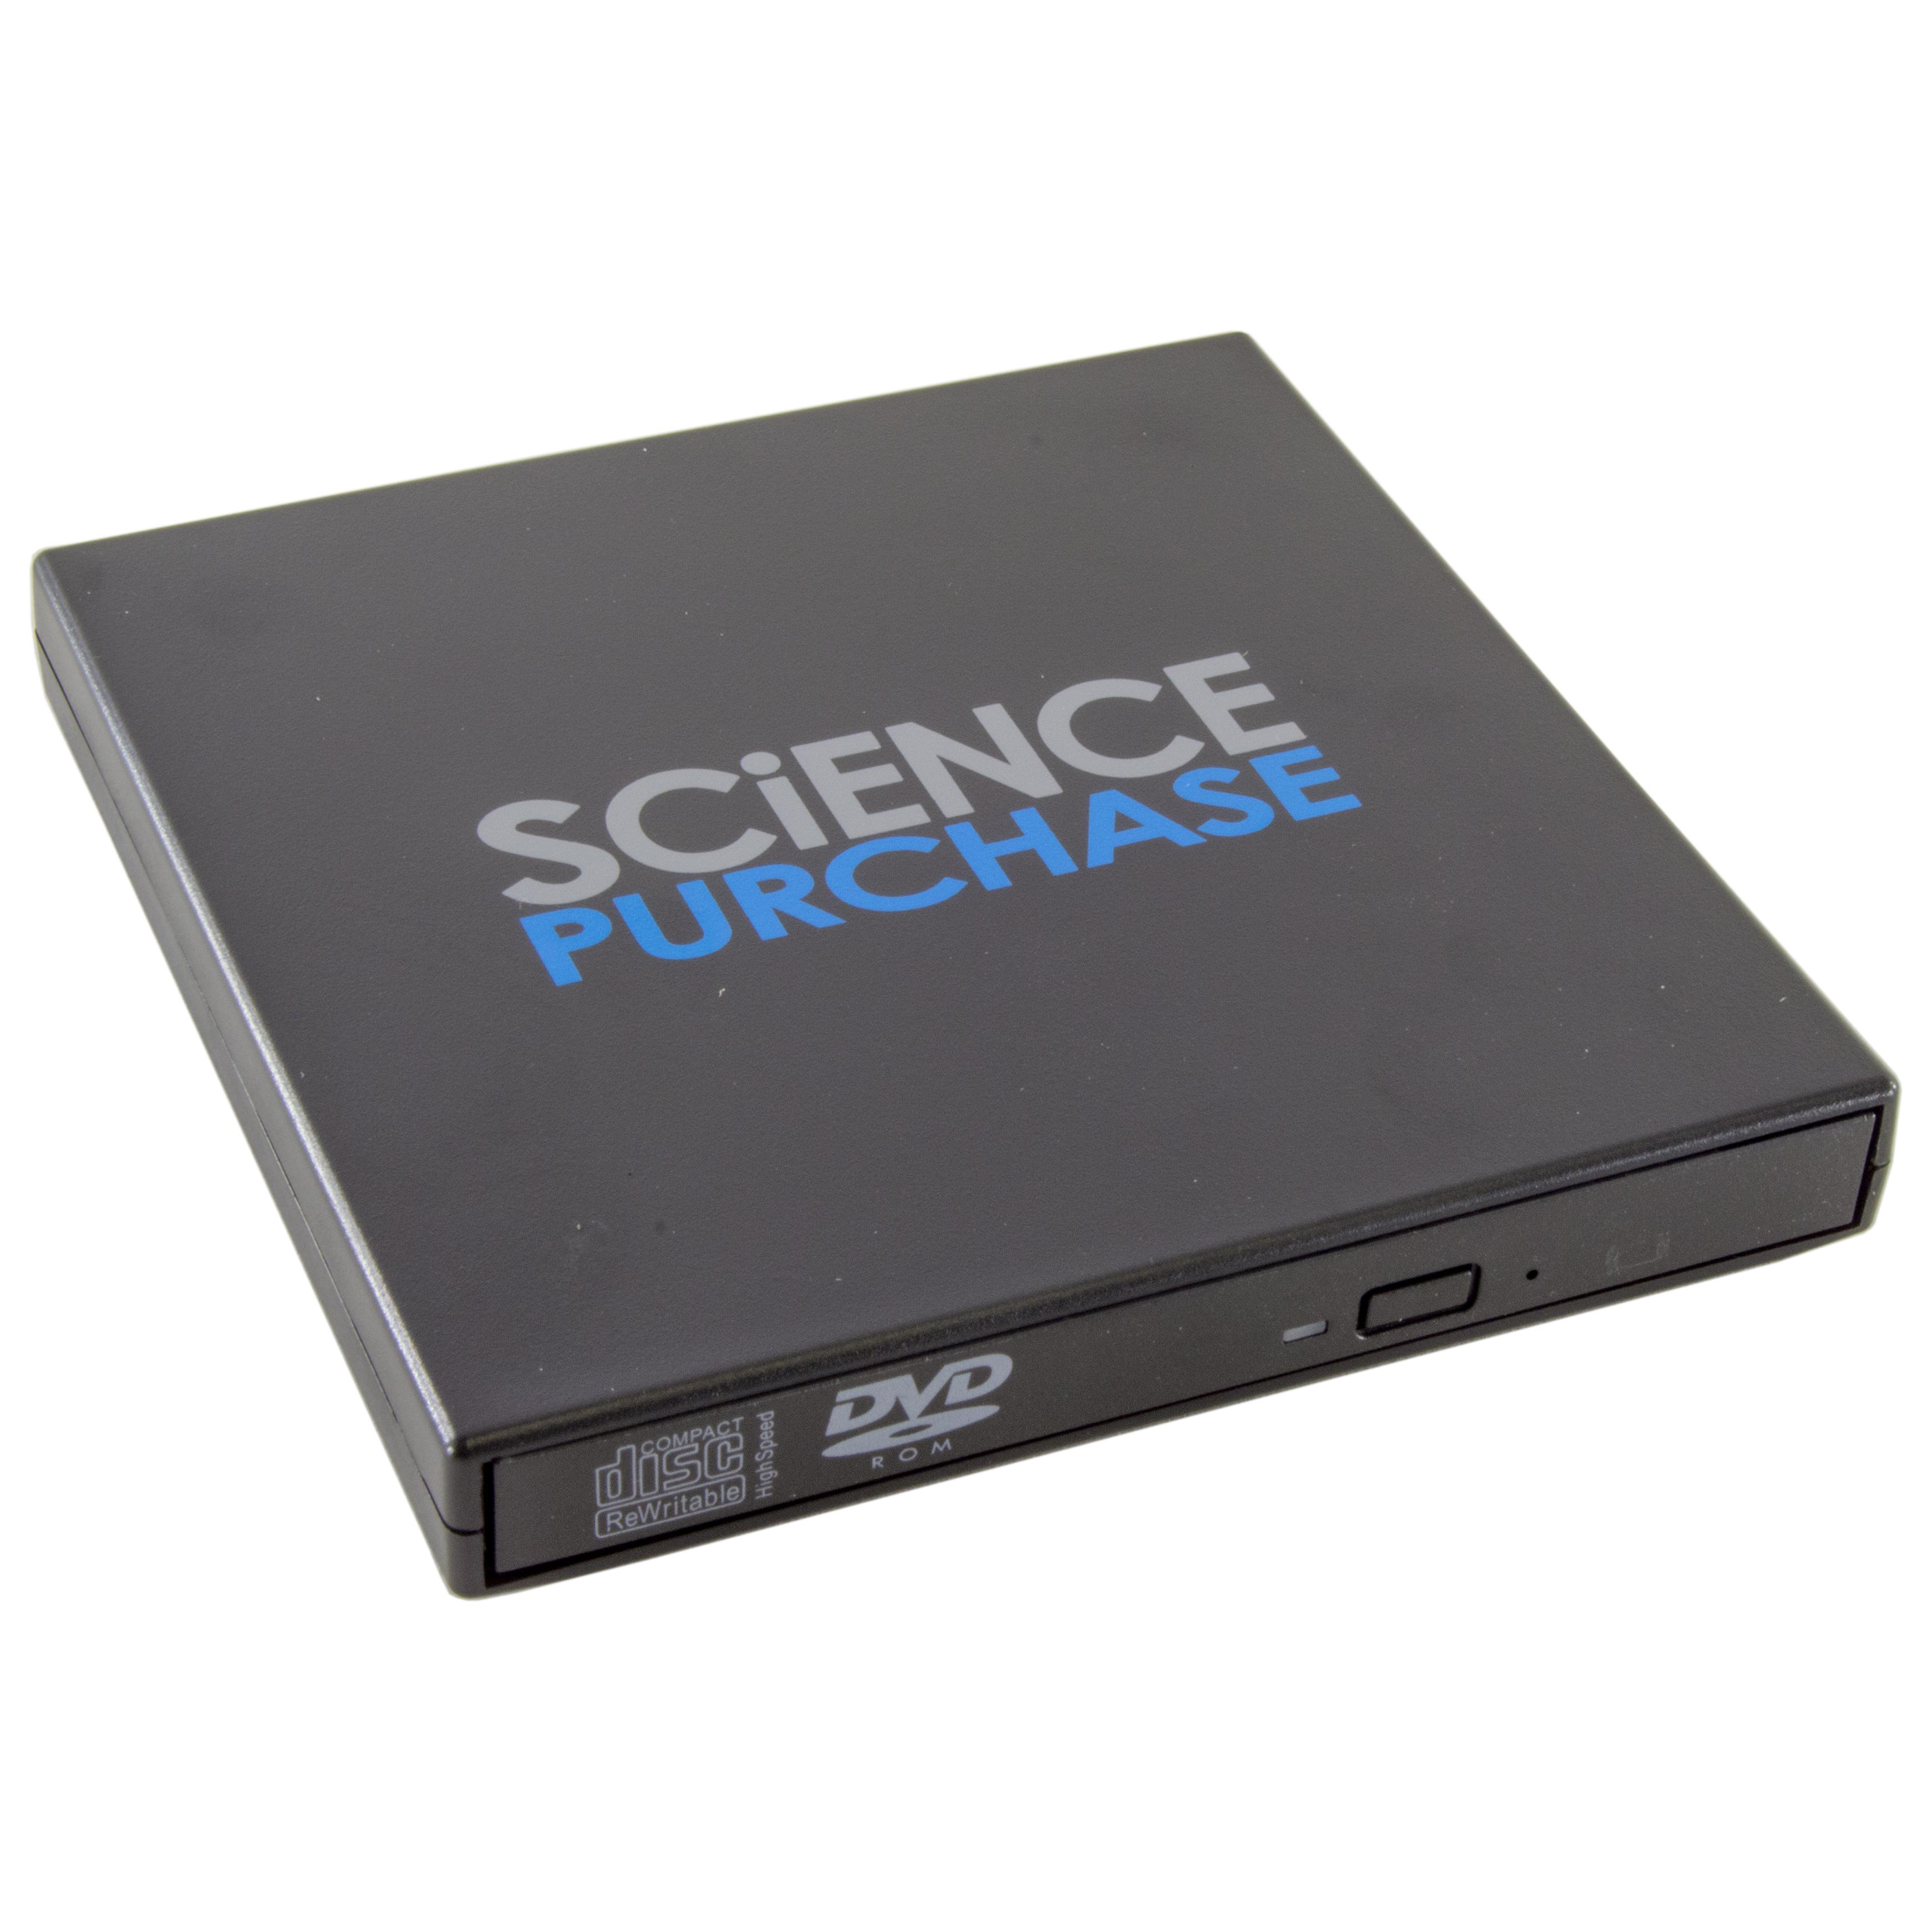 USB 2.0 Slim External DVD ROM CD-RW Combo Drive Writer